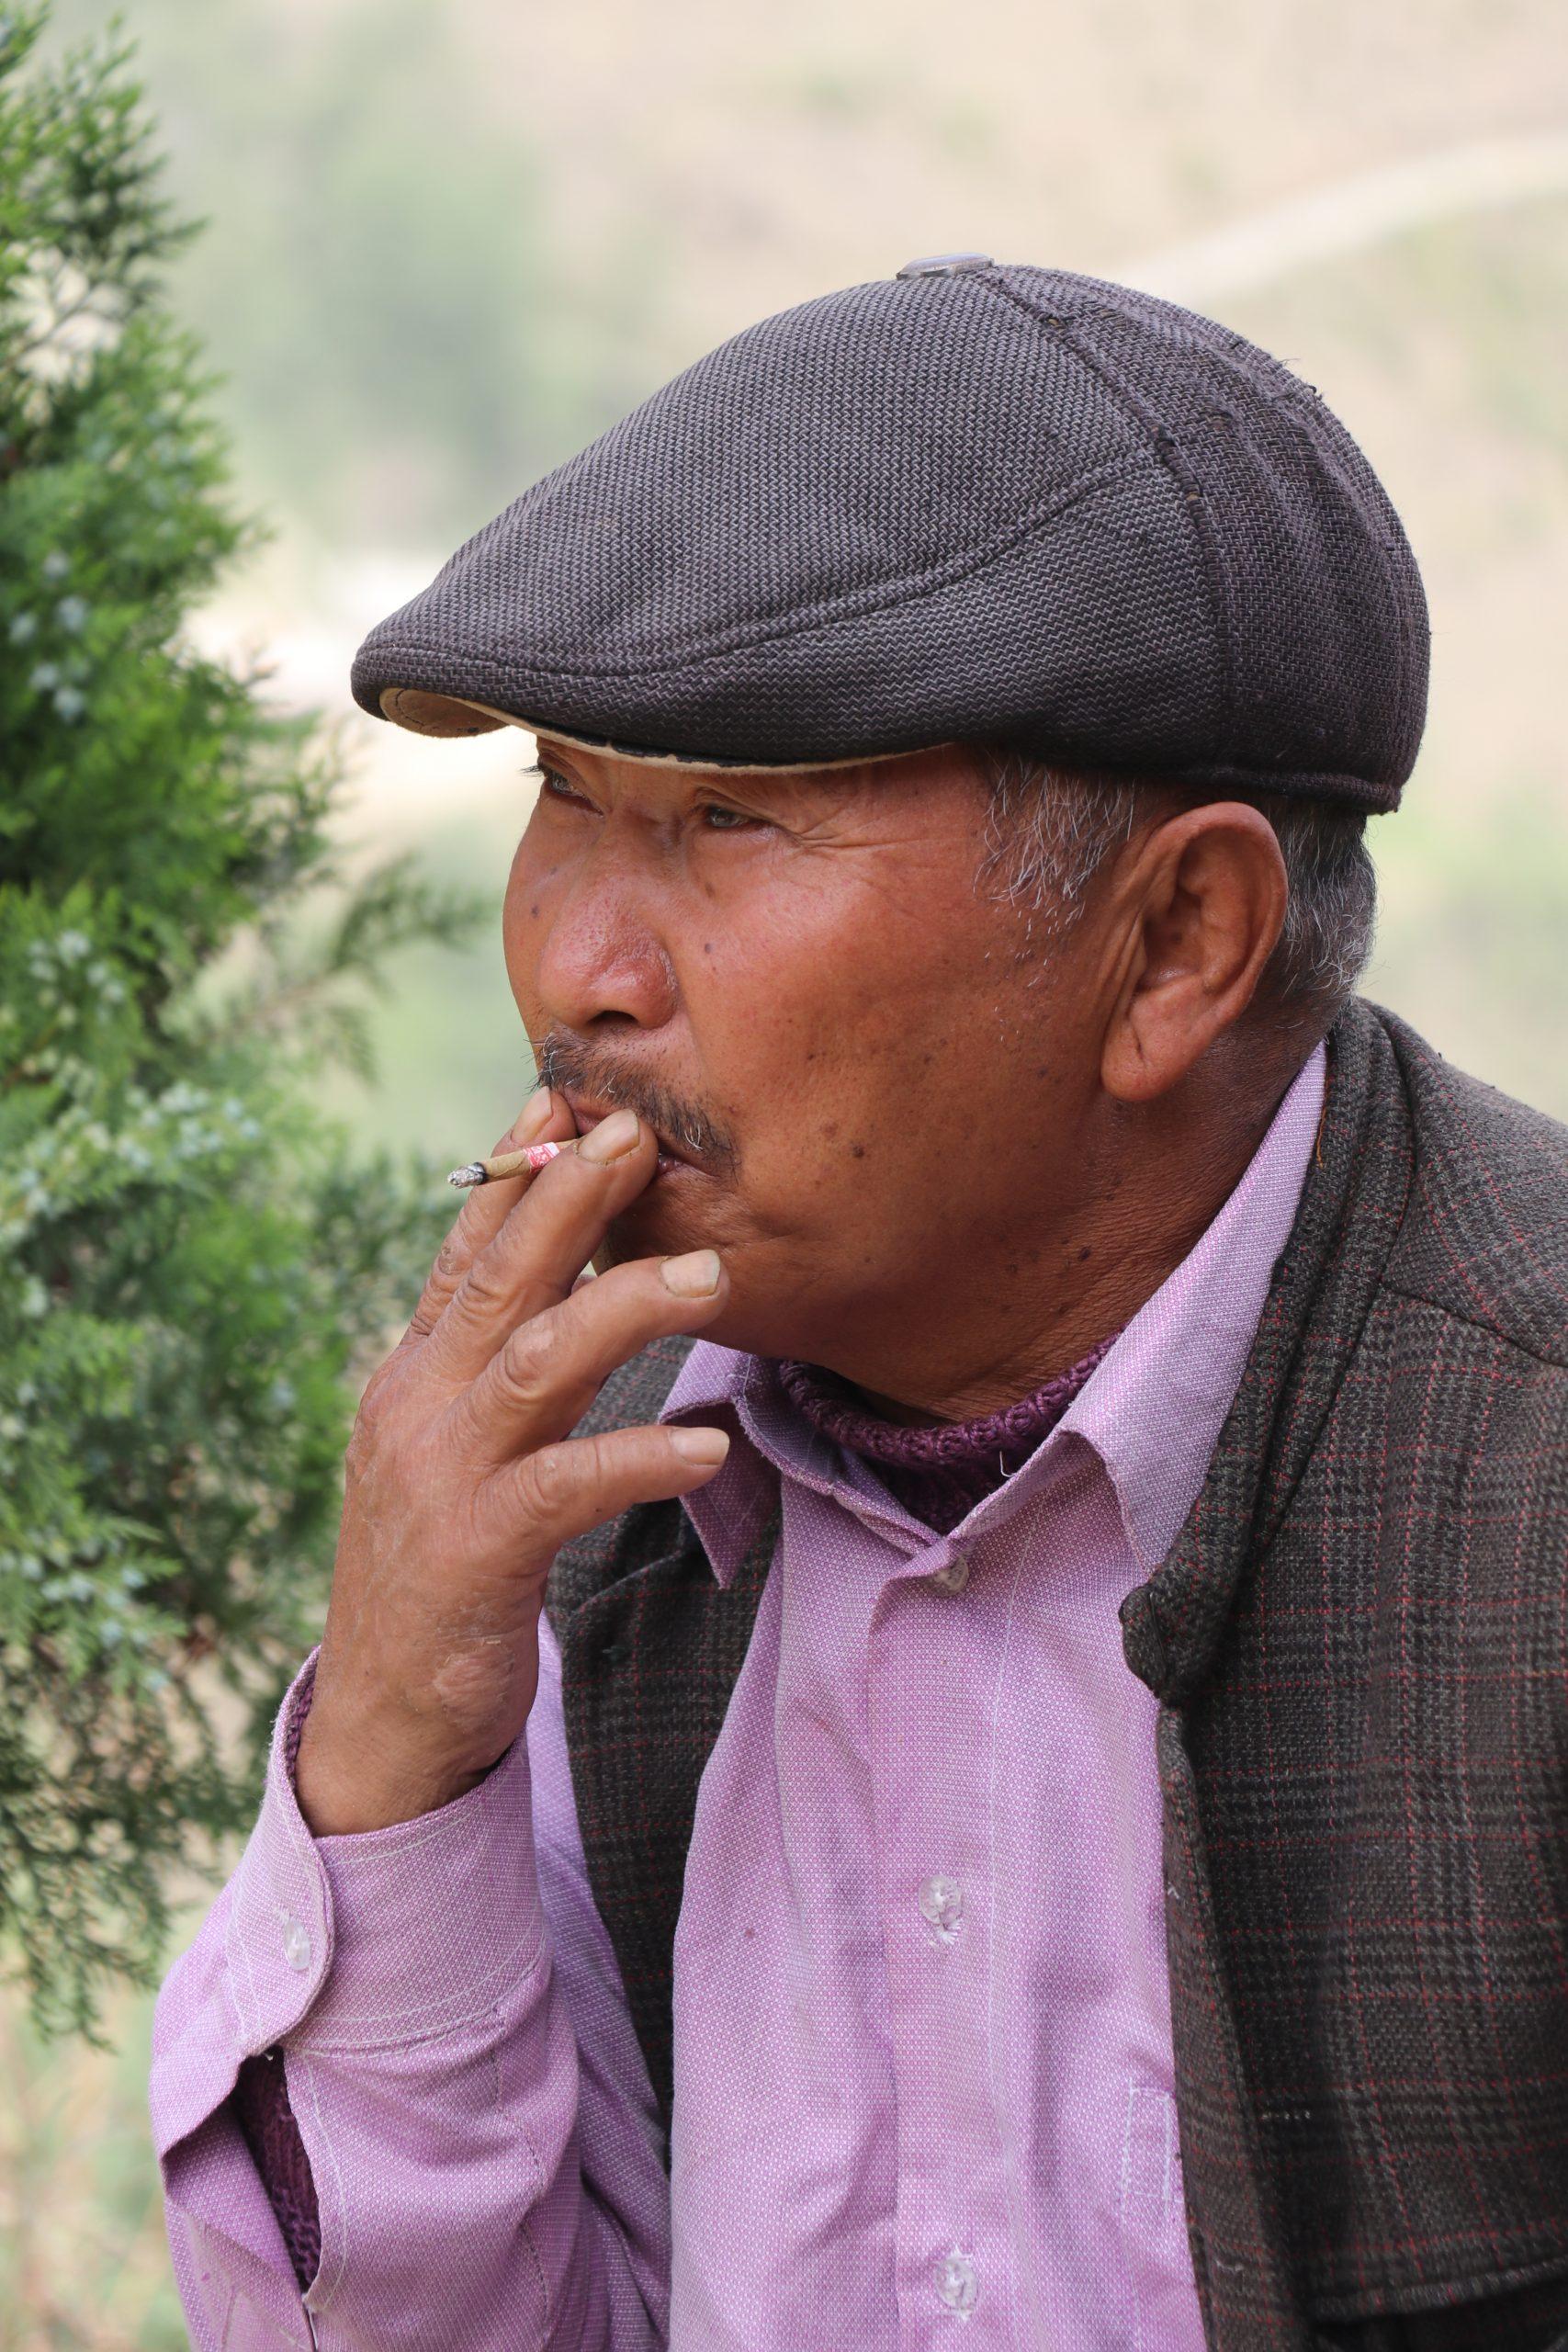 A smoking man